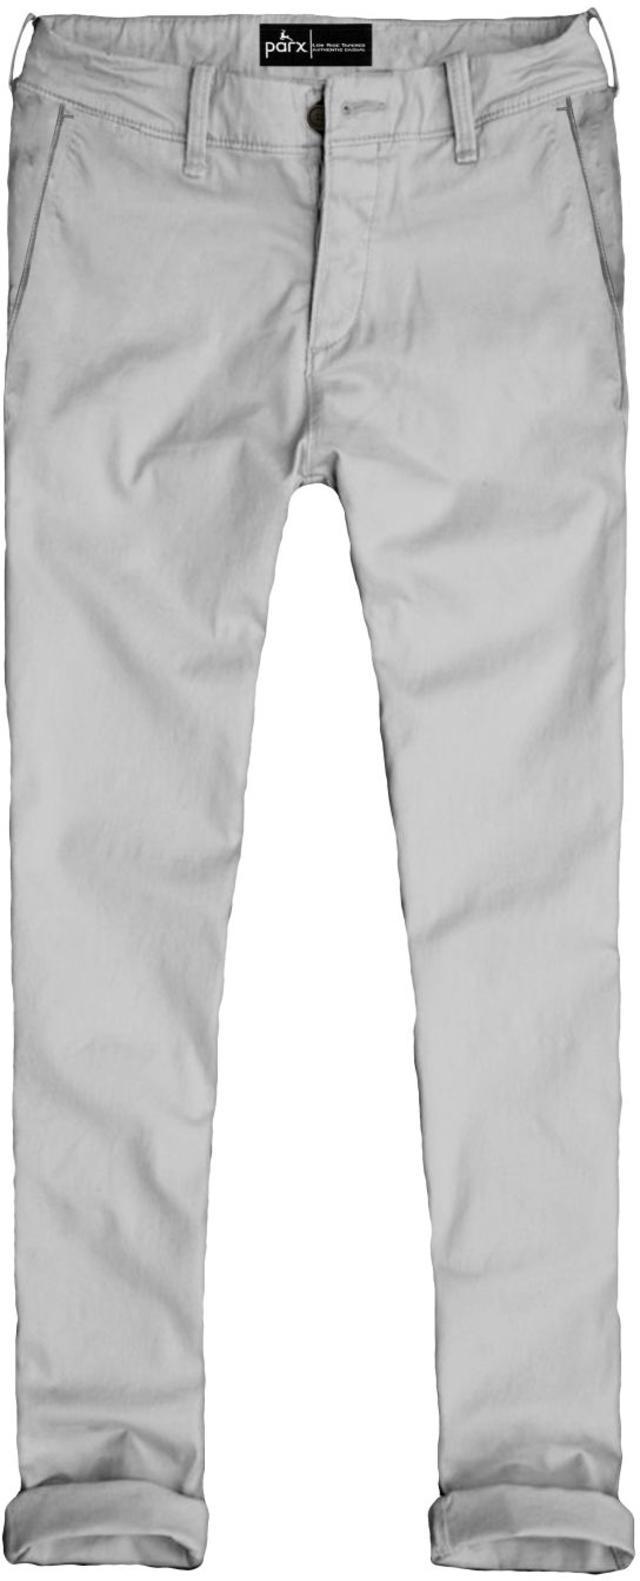 PARX | XMTT02727W1 White Formal Trousers